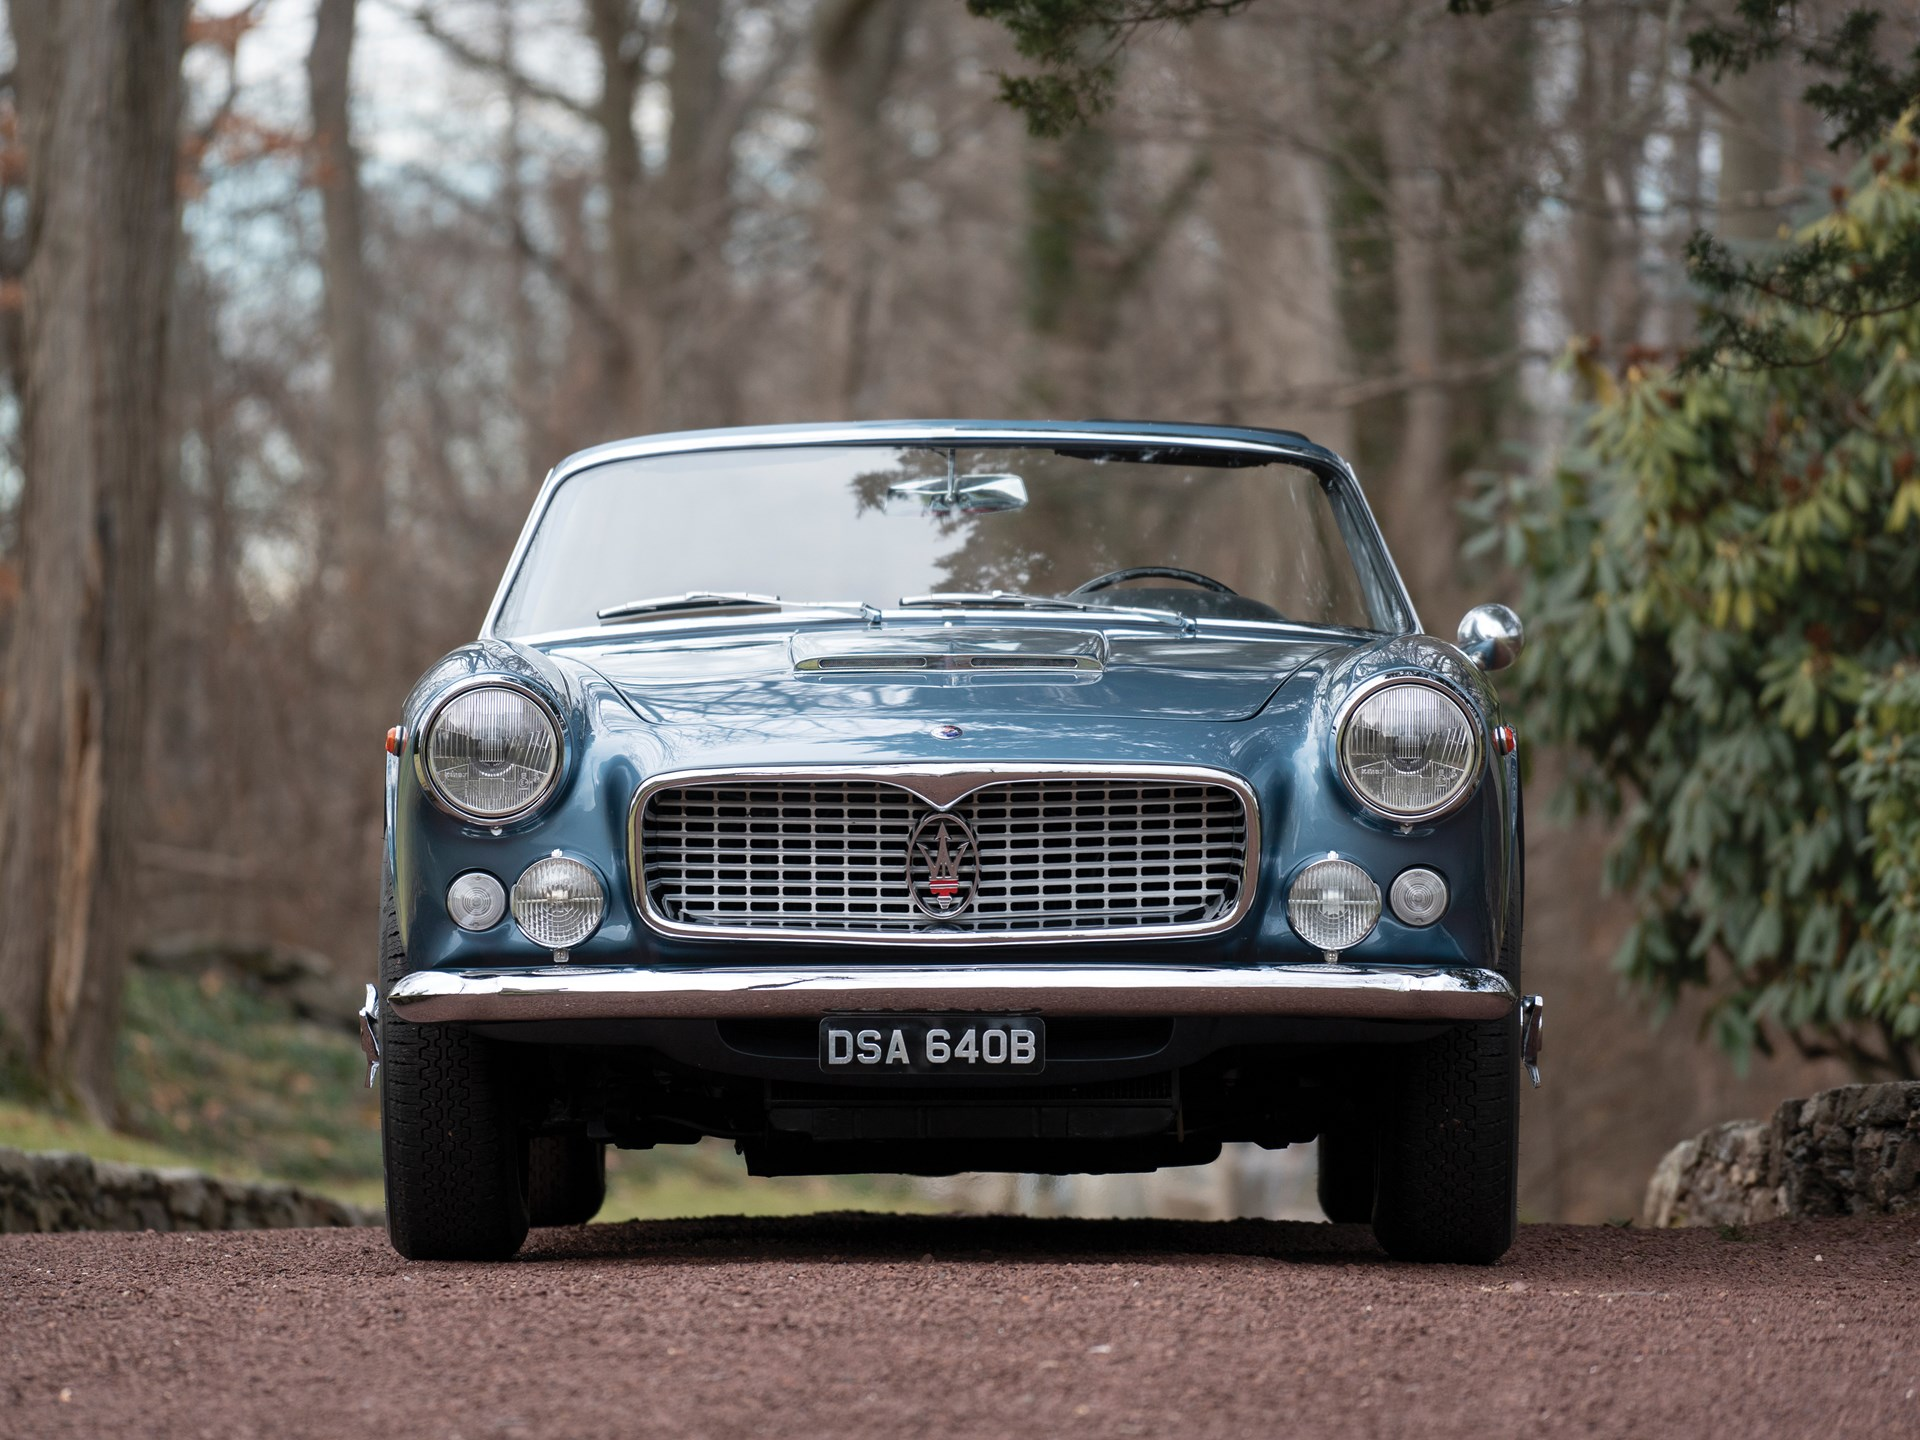 1964 Maserati 3500 GTi Spyder by Vignale